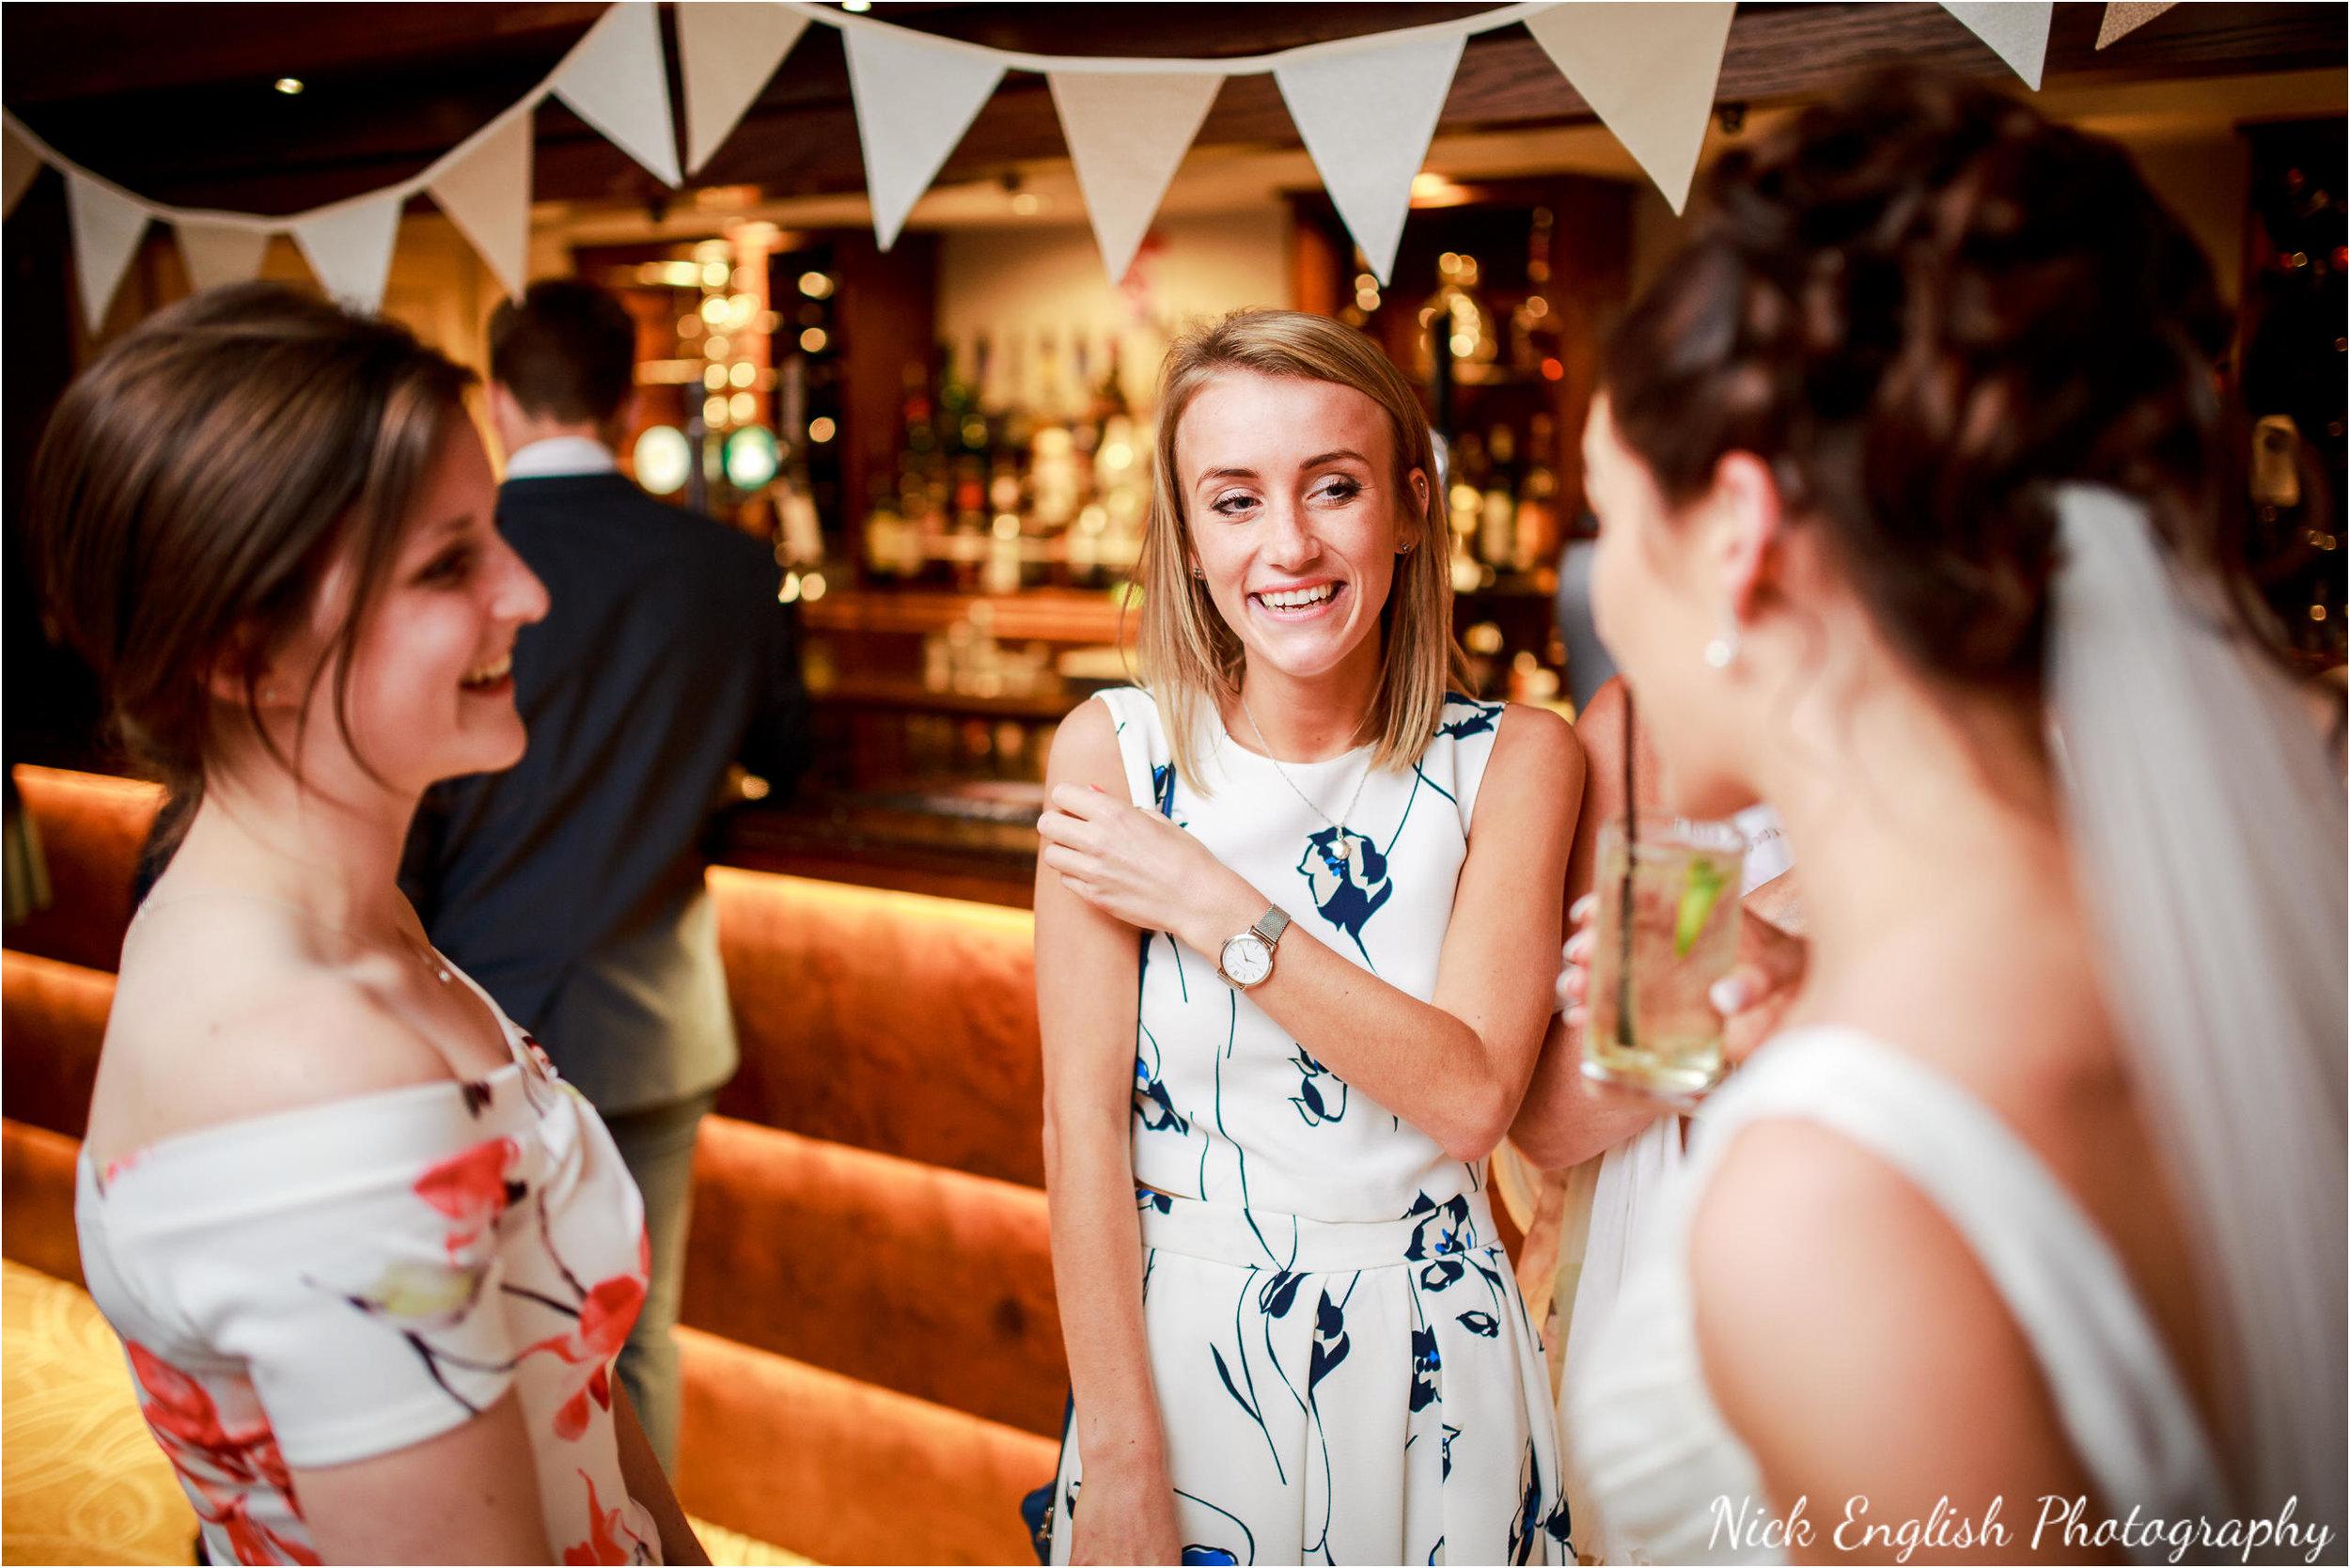 Emily David Wedding Photographs at Barton Grange Preston by Nick English Photography 205jpg.jpeg